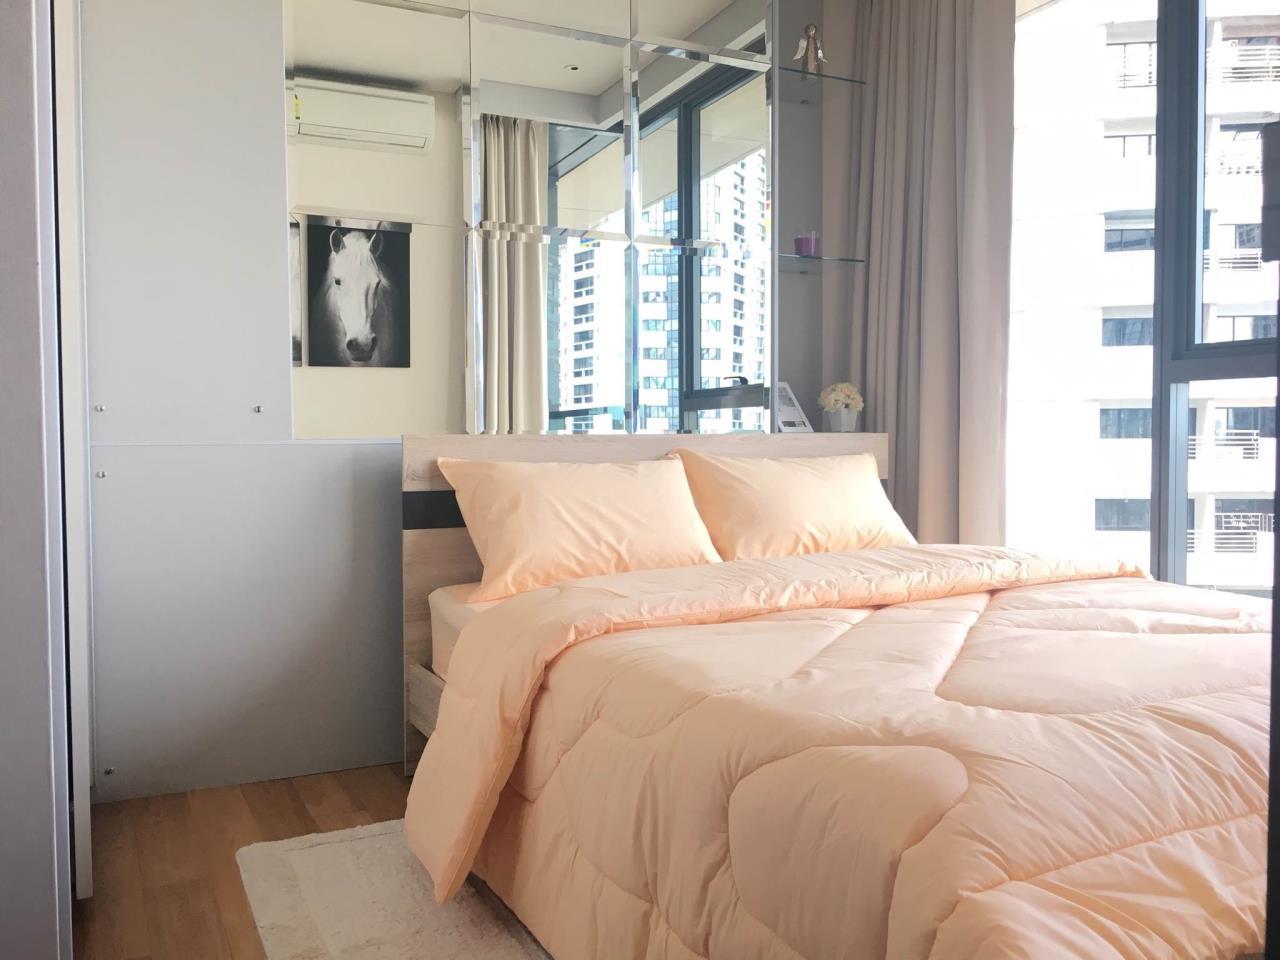 Quality Life Property Agency's S A L E & R E N T !! [ THE LUMPINI 24 ] 1 BR 26.22 Sq.m. Amazing View & Nice Decoration !! 1